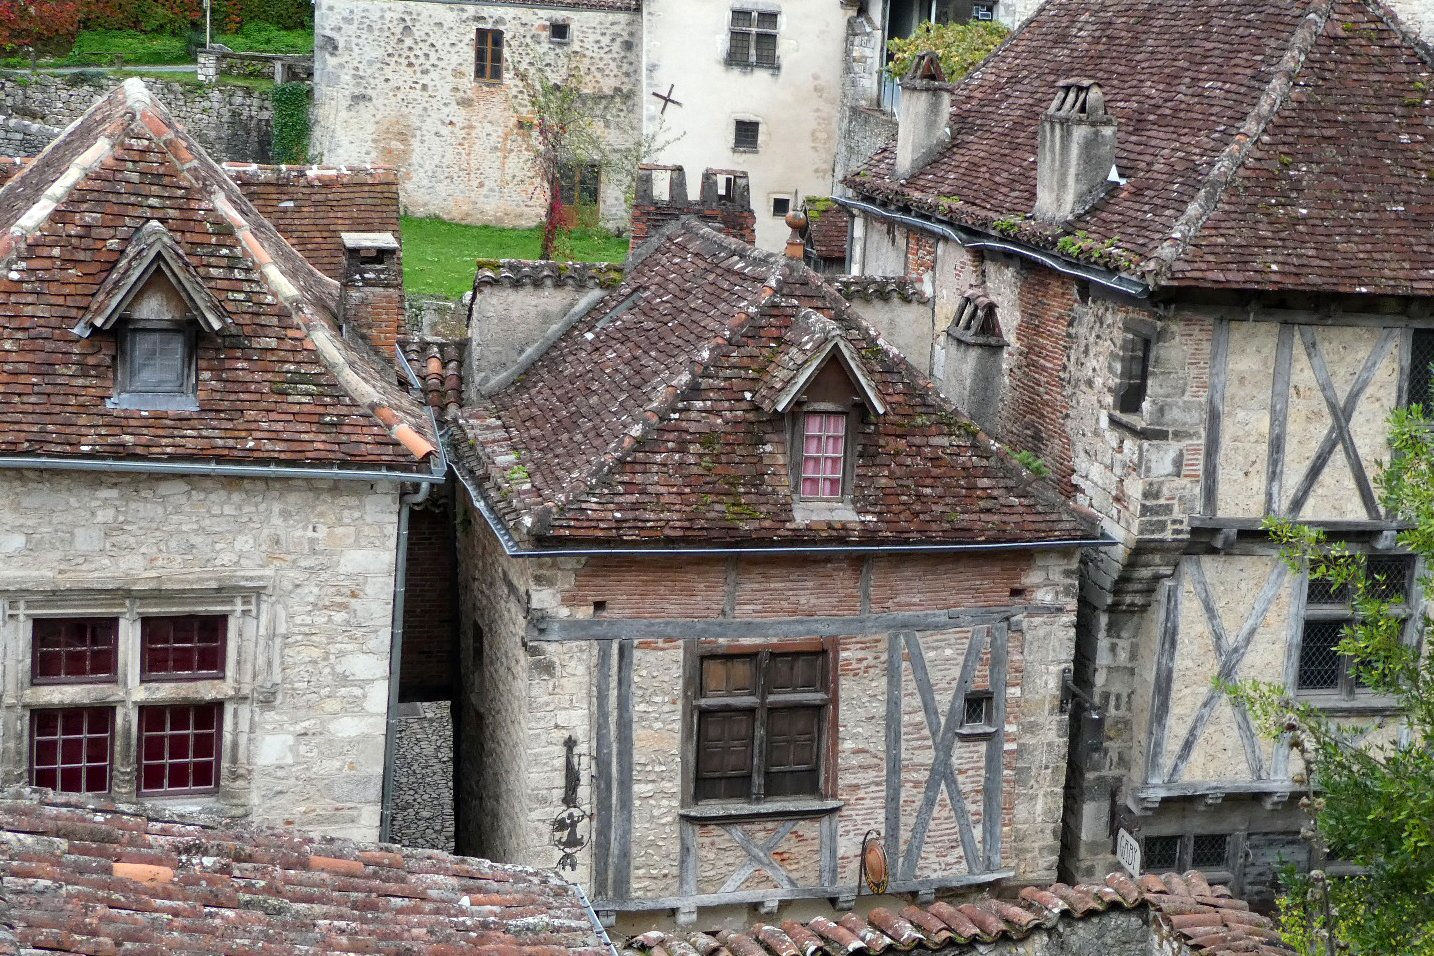 huse i Saint-Circ-Lapopier